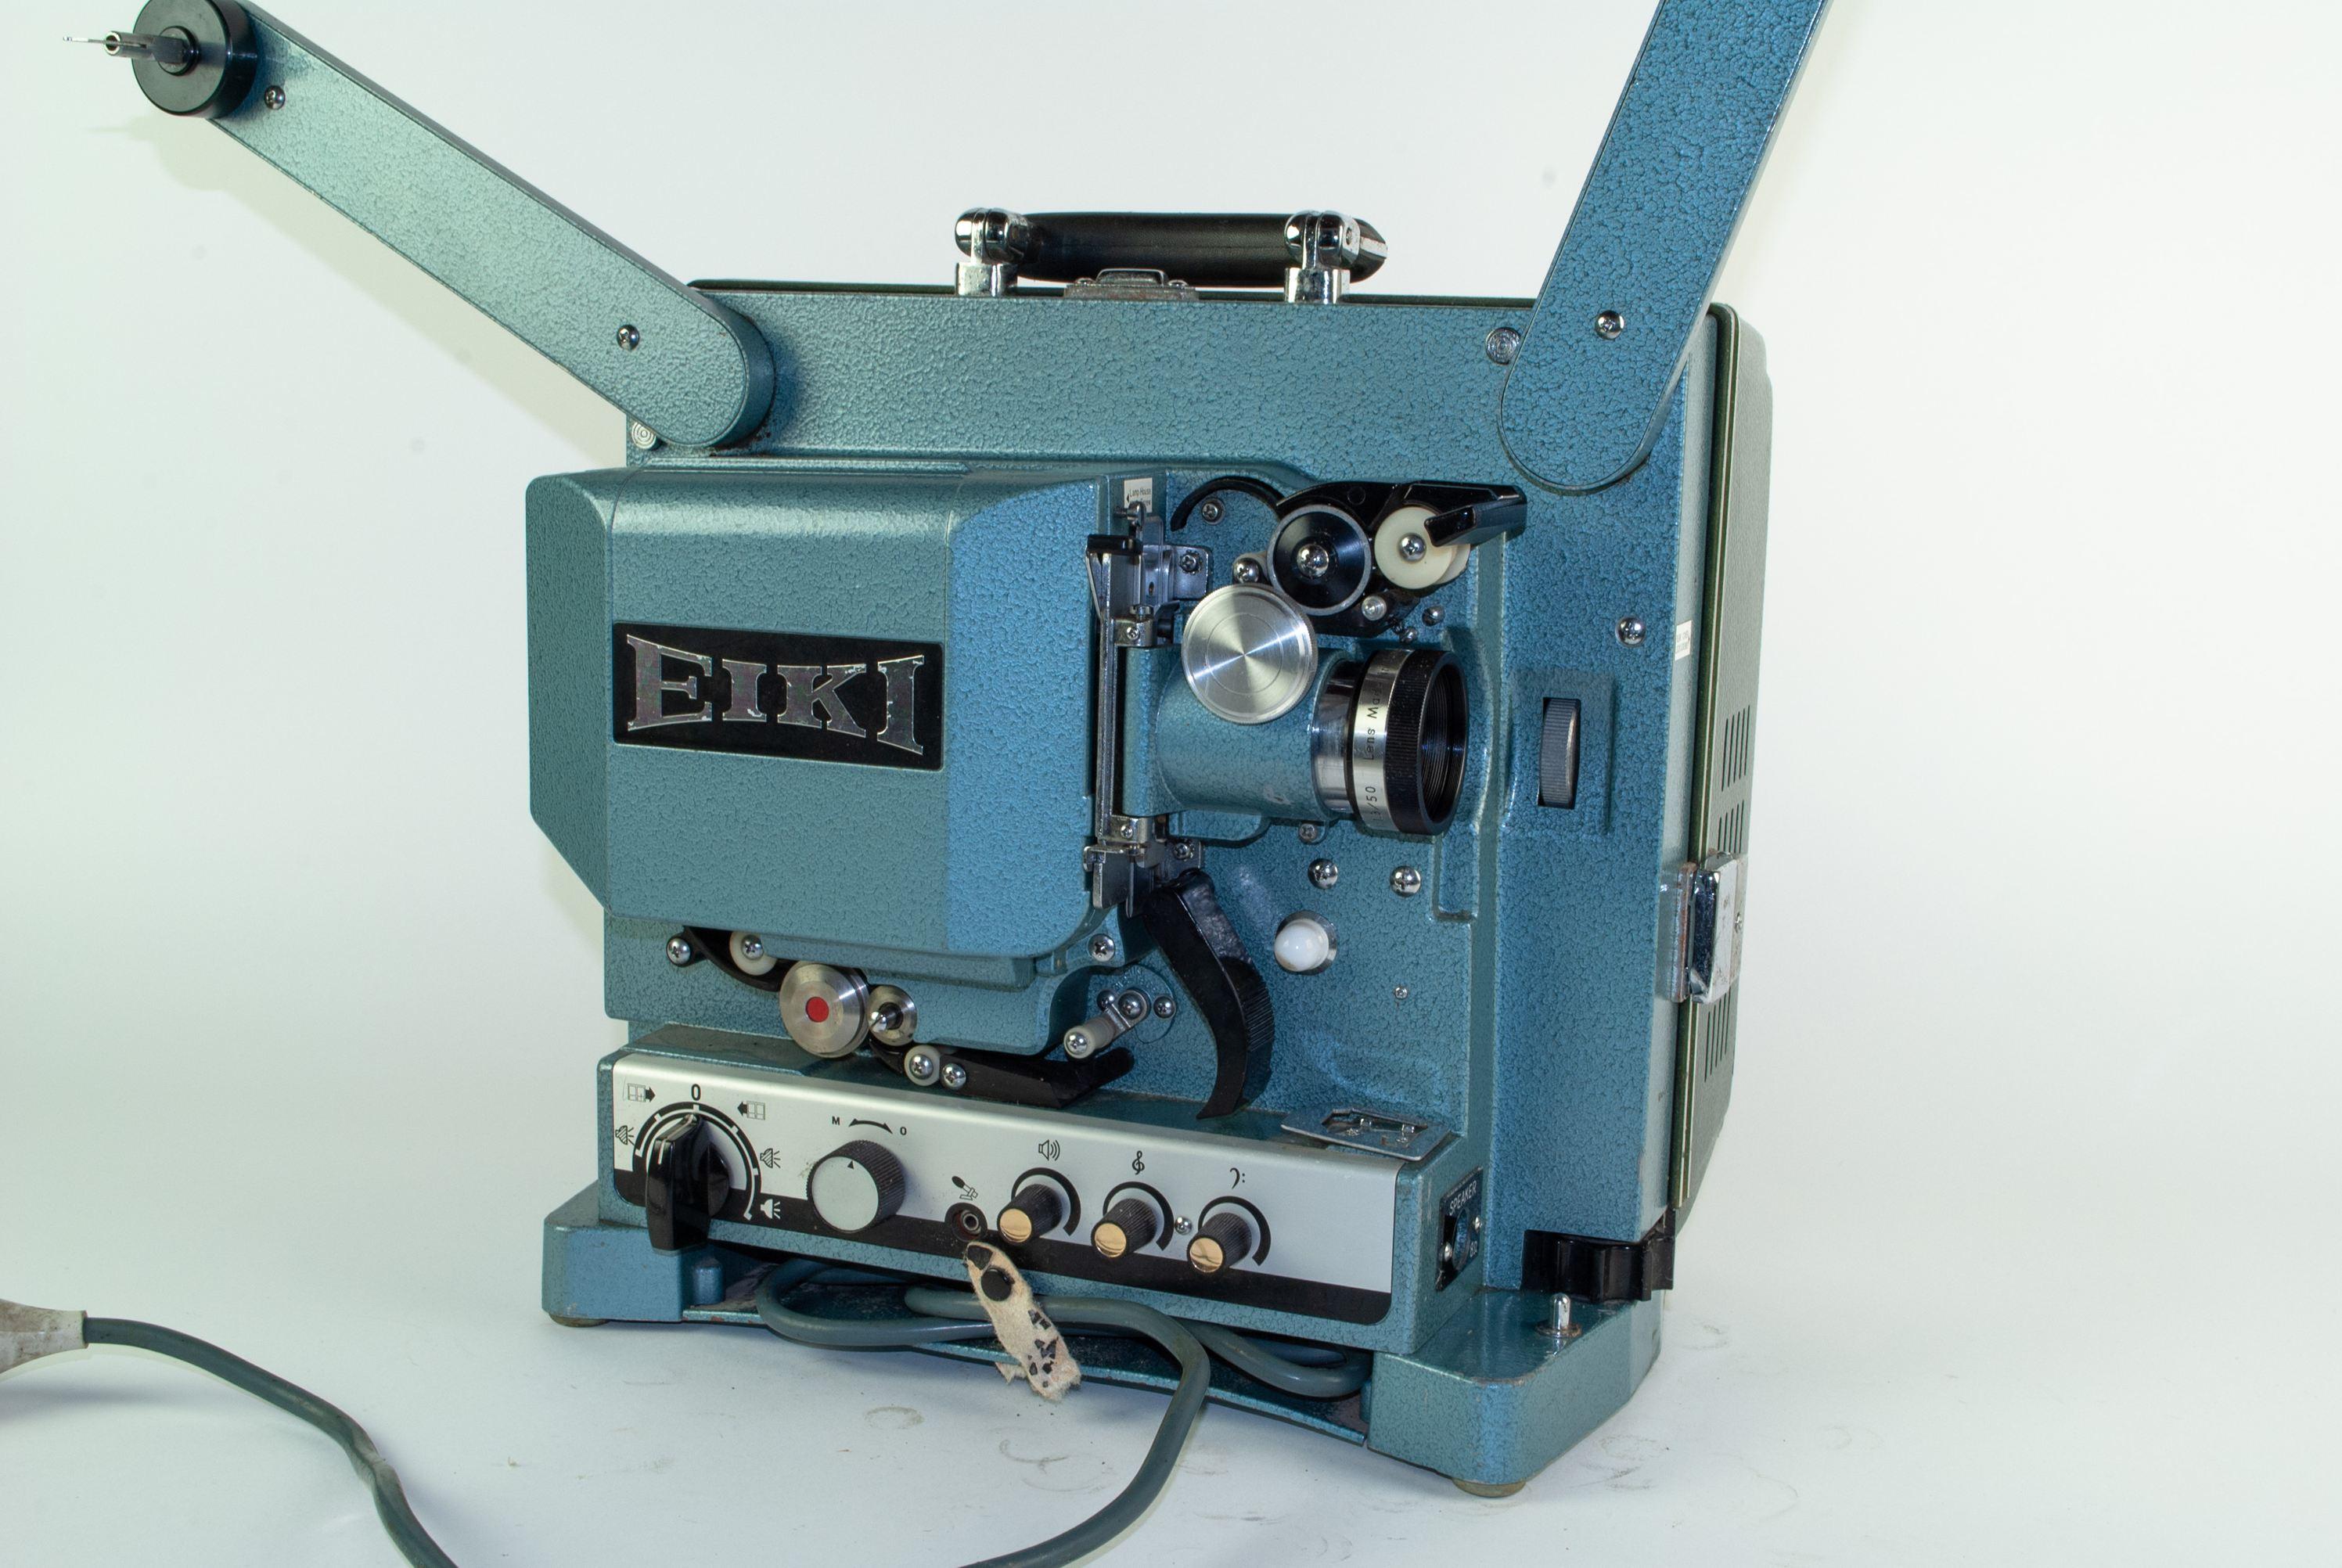 Eiki RT-2